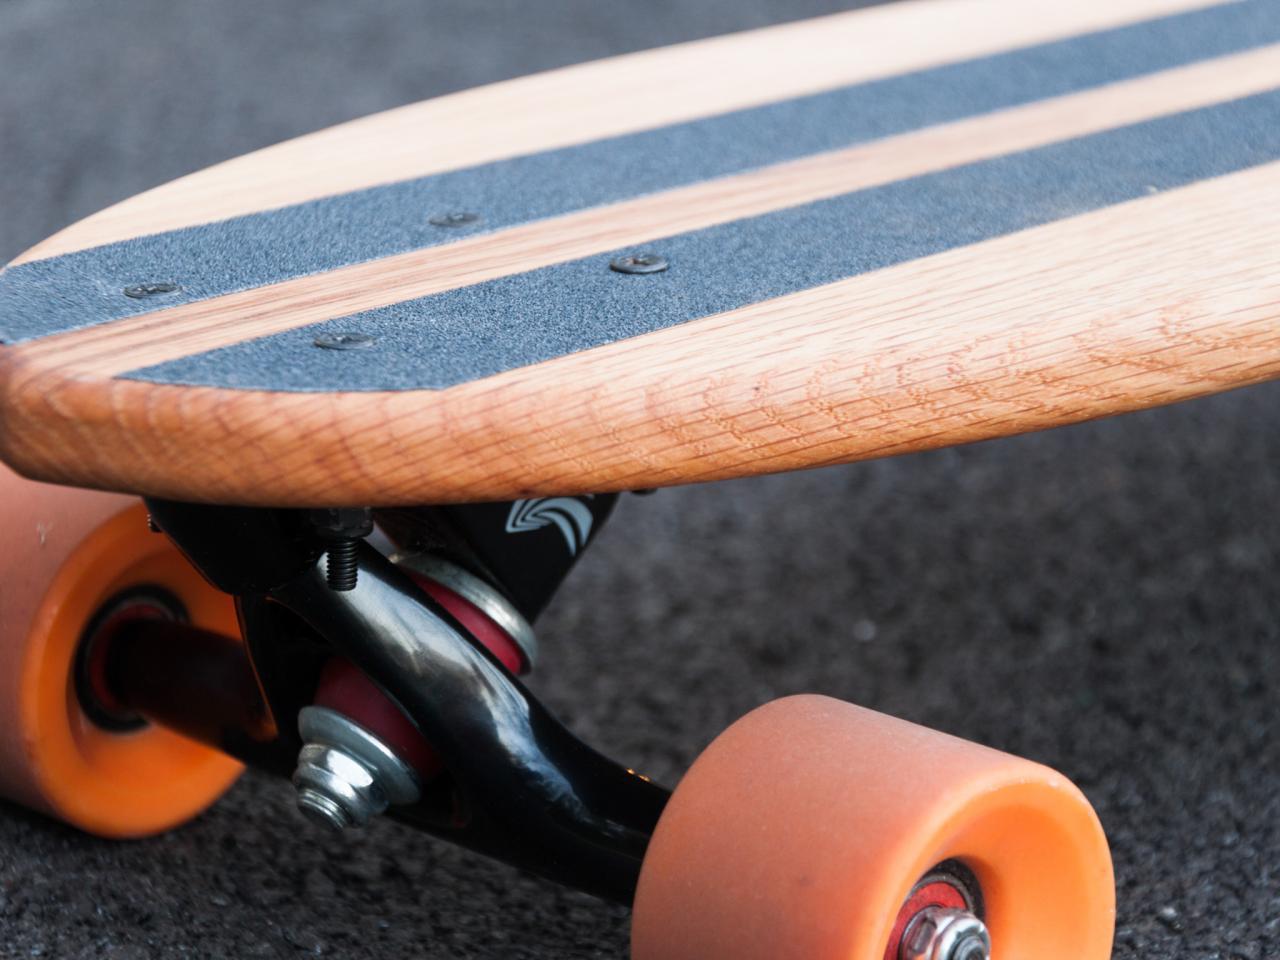 How Skateboards Are Made : how to make a skateboard diy network blog made remade diy ~ Russianpoet.info Haus und Dekorationen